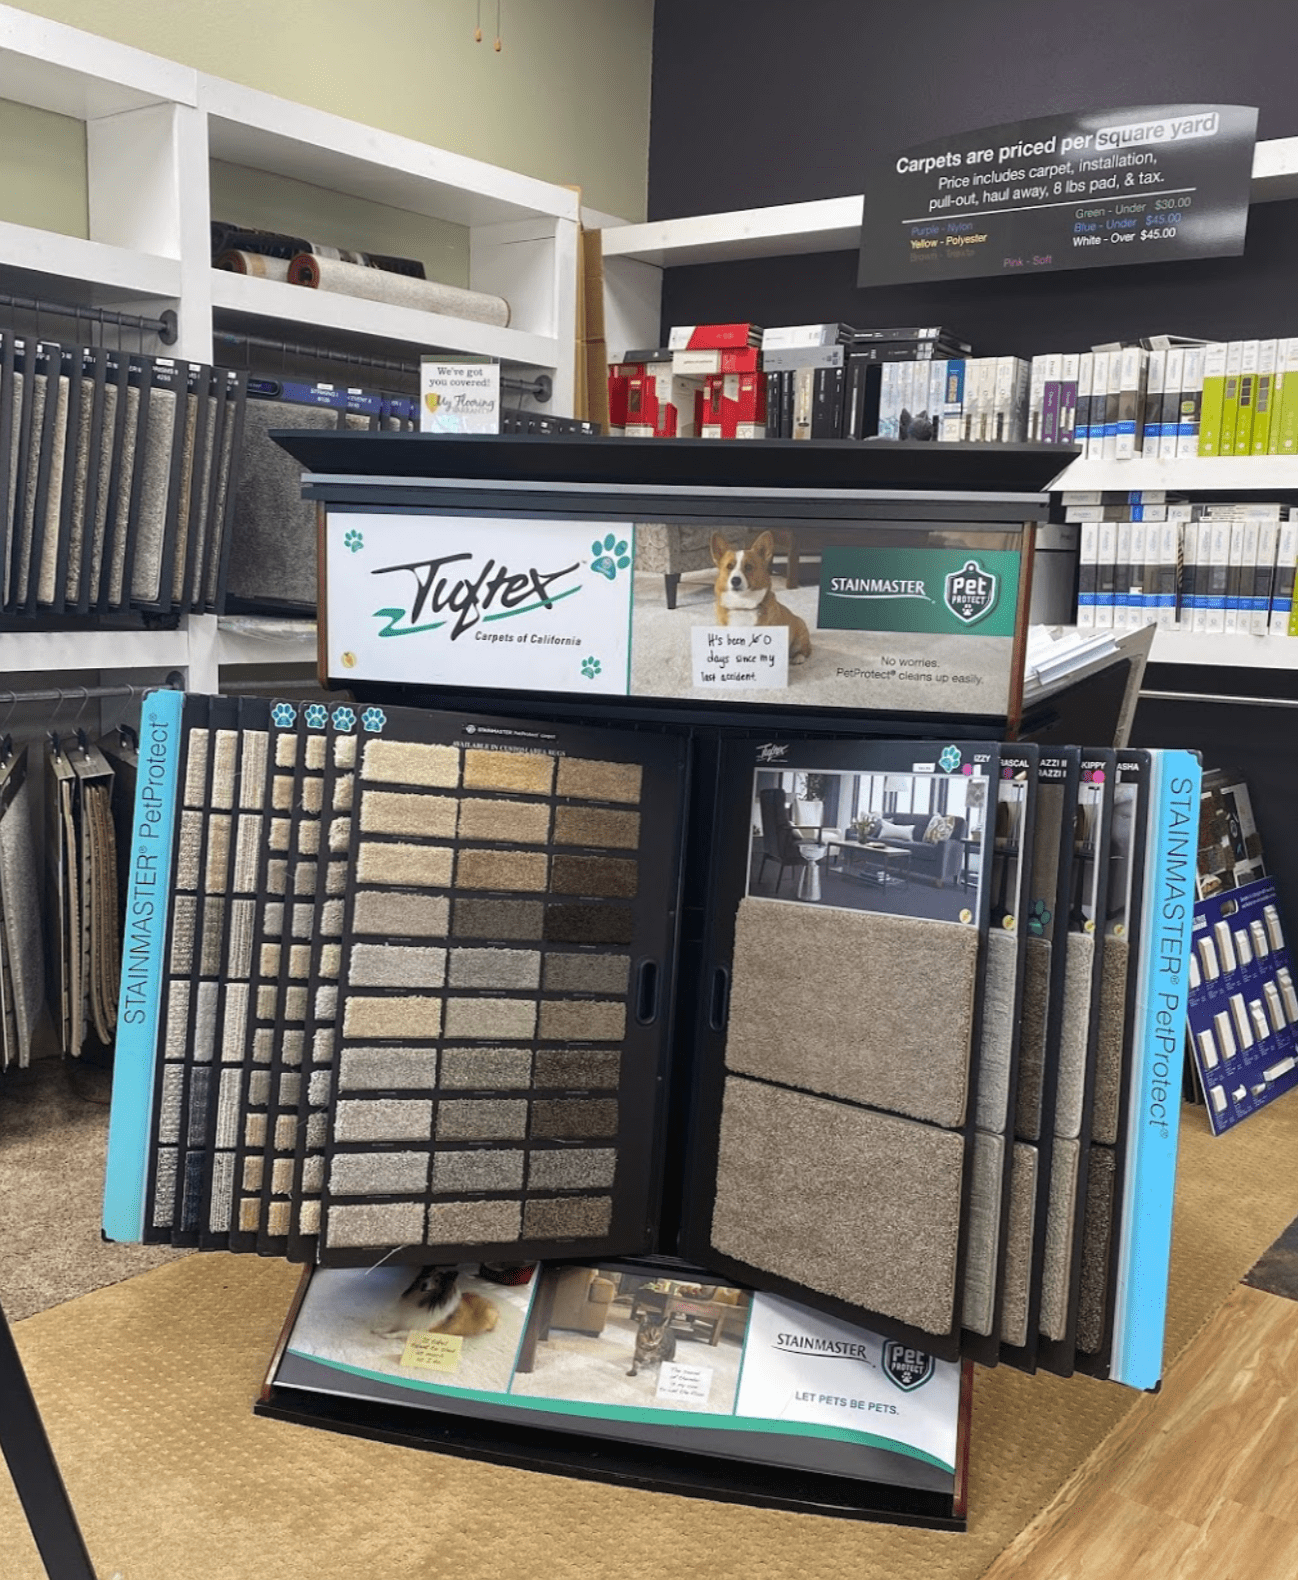 Carpet in Windsor, CA from Carpet Center